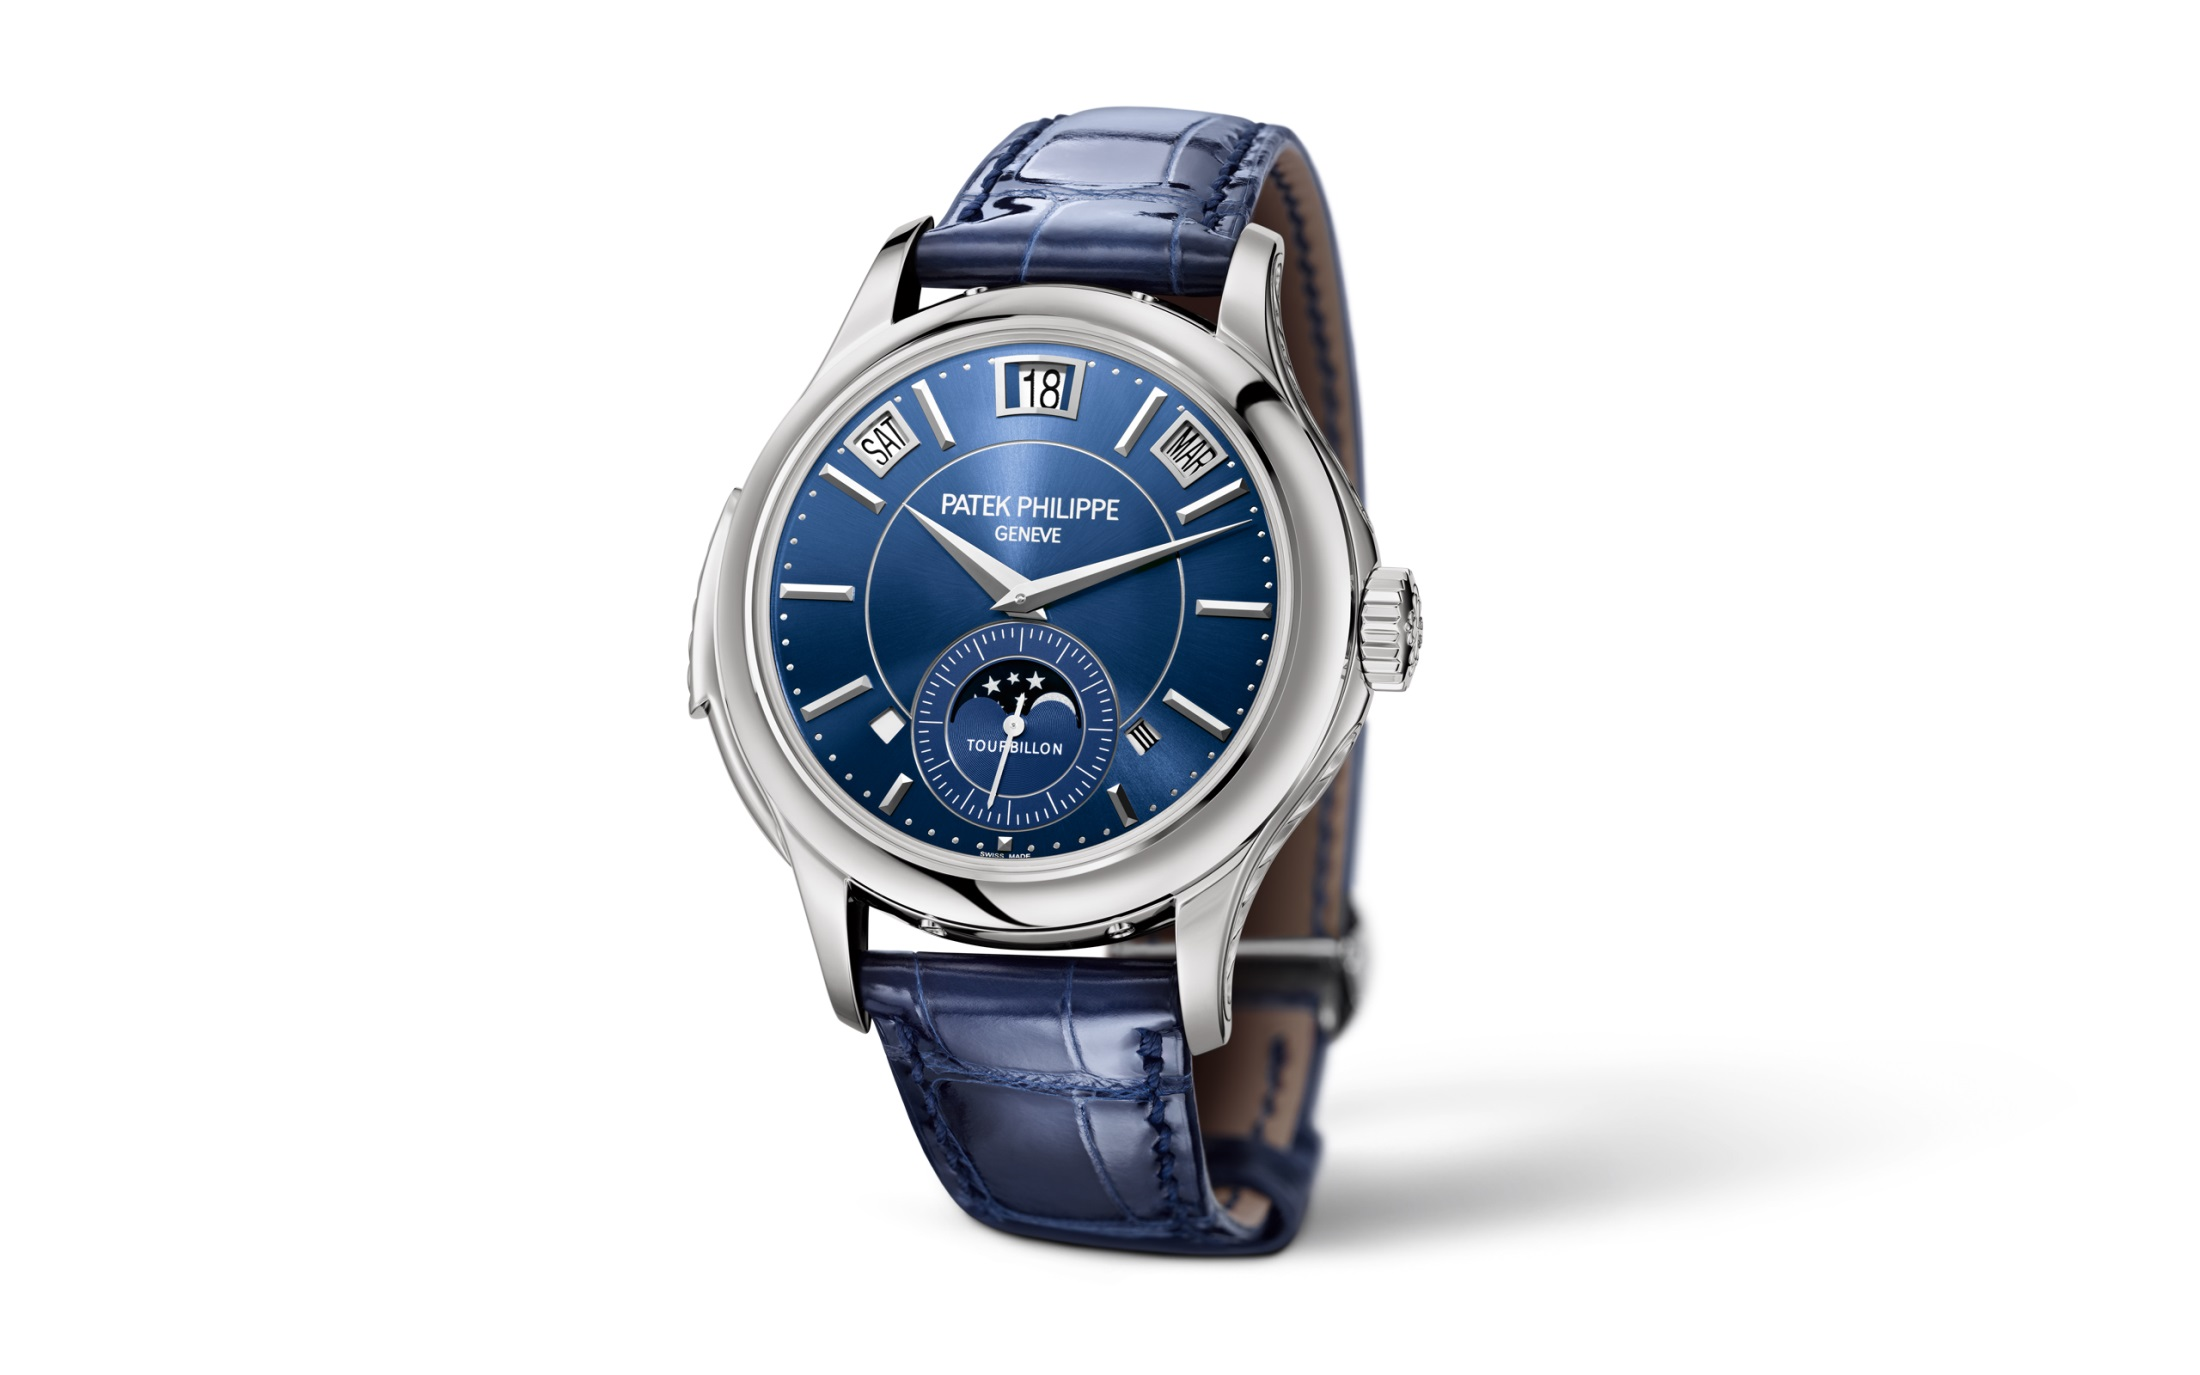 Мужские наручные часы Patek Philippe - Патек Филипп